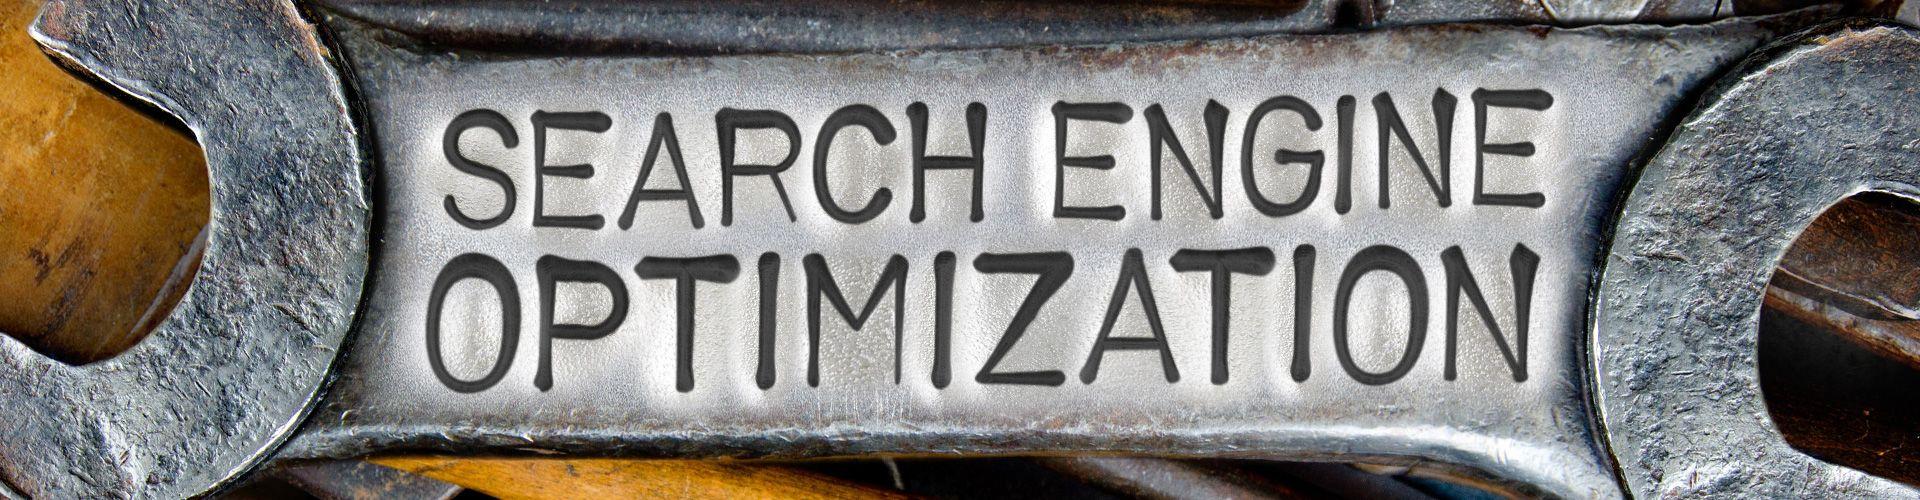 Search Engine Optimization Certification Marketing Training